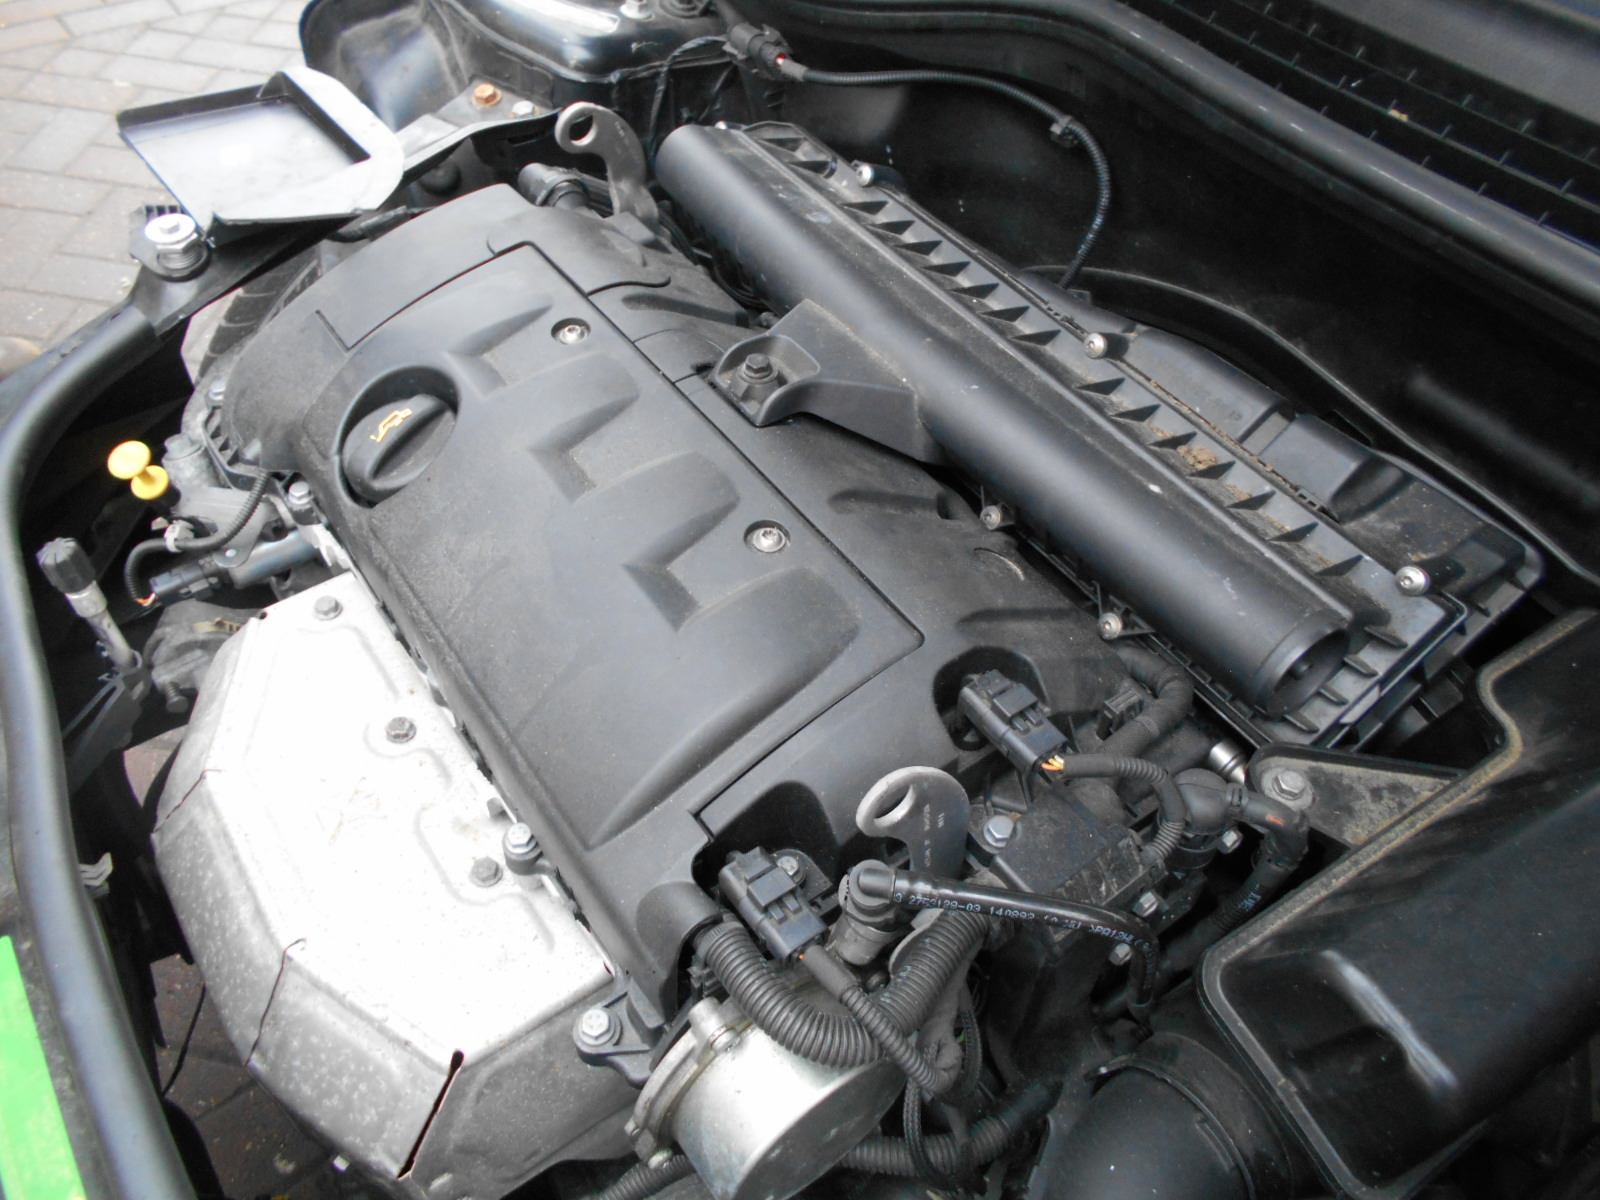 08 Black 1.4 BMW Mini One - 8